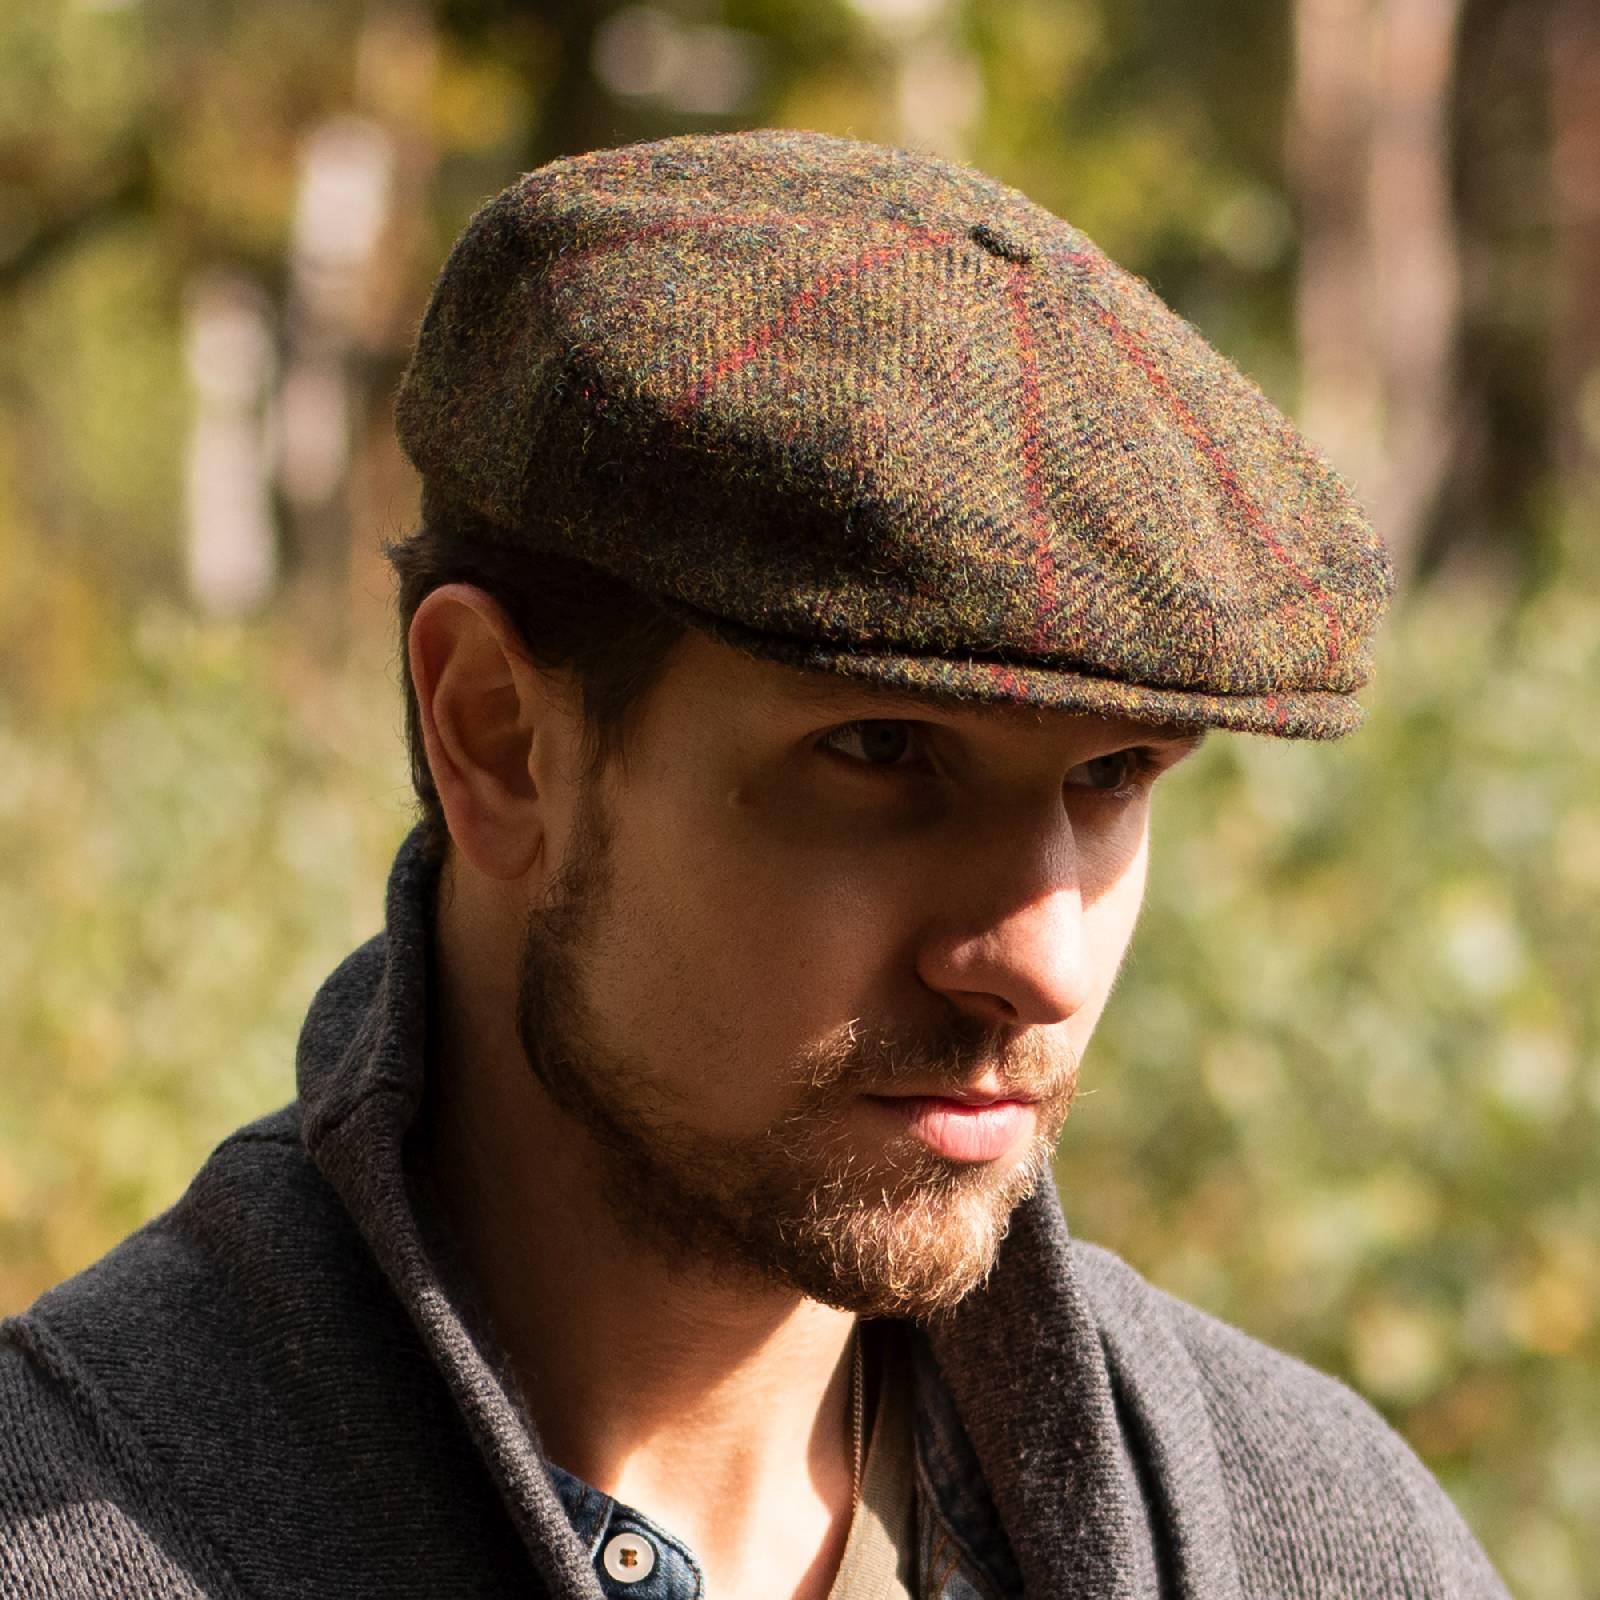 Shelby - wintermütze Harris Tweed, mütze männer, blau, khaki mütze